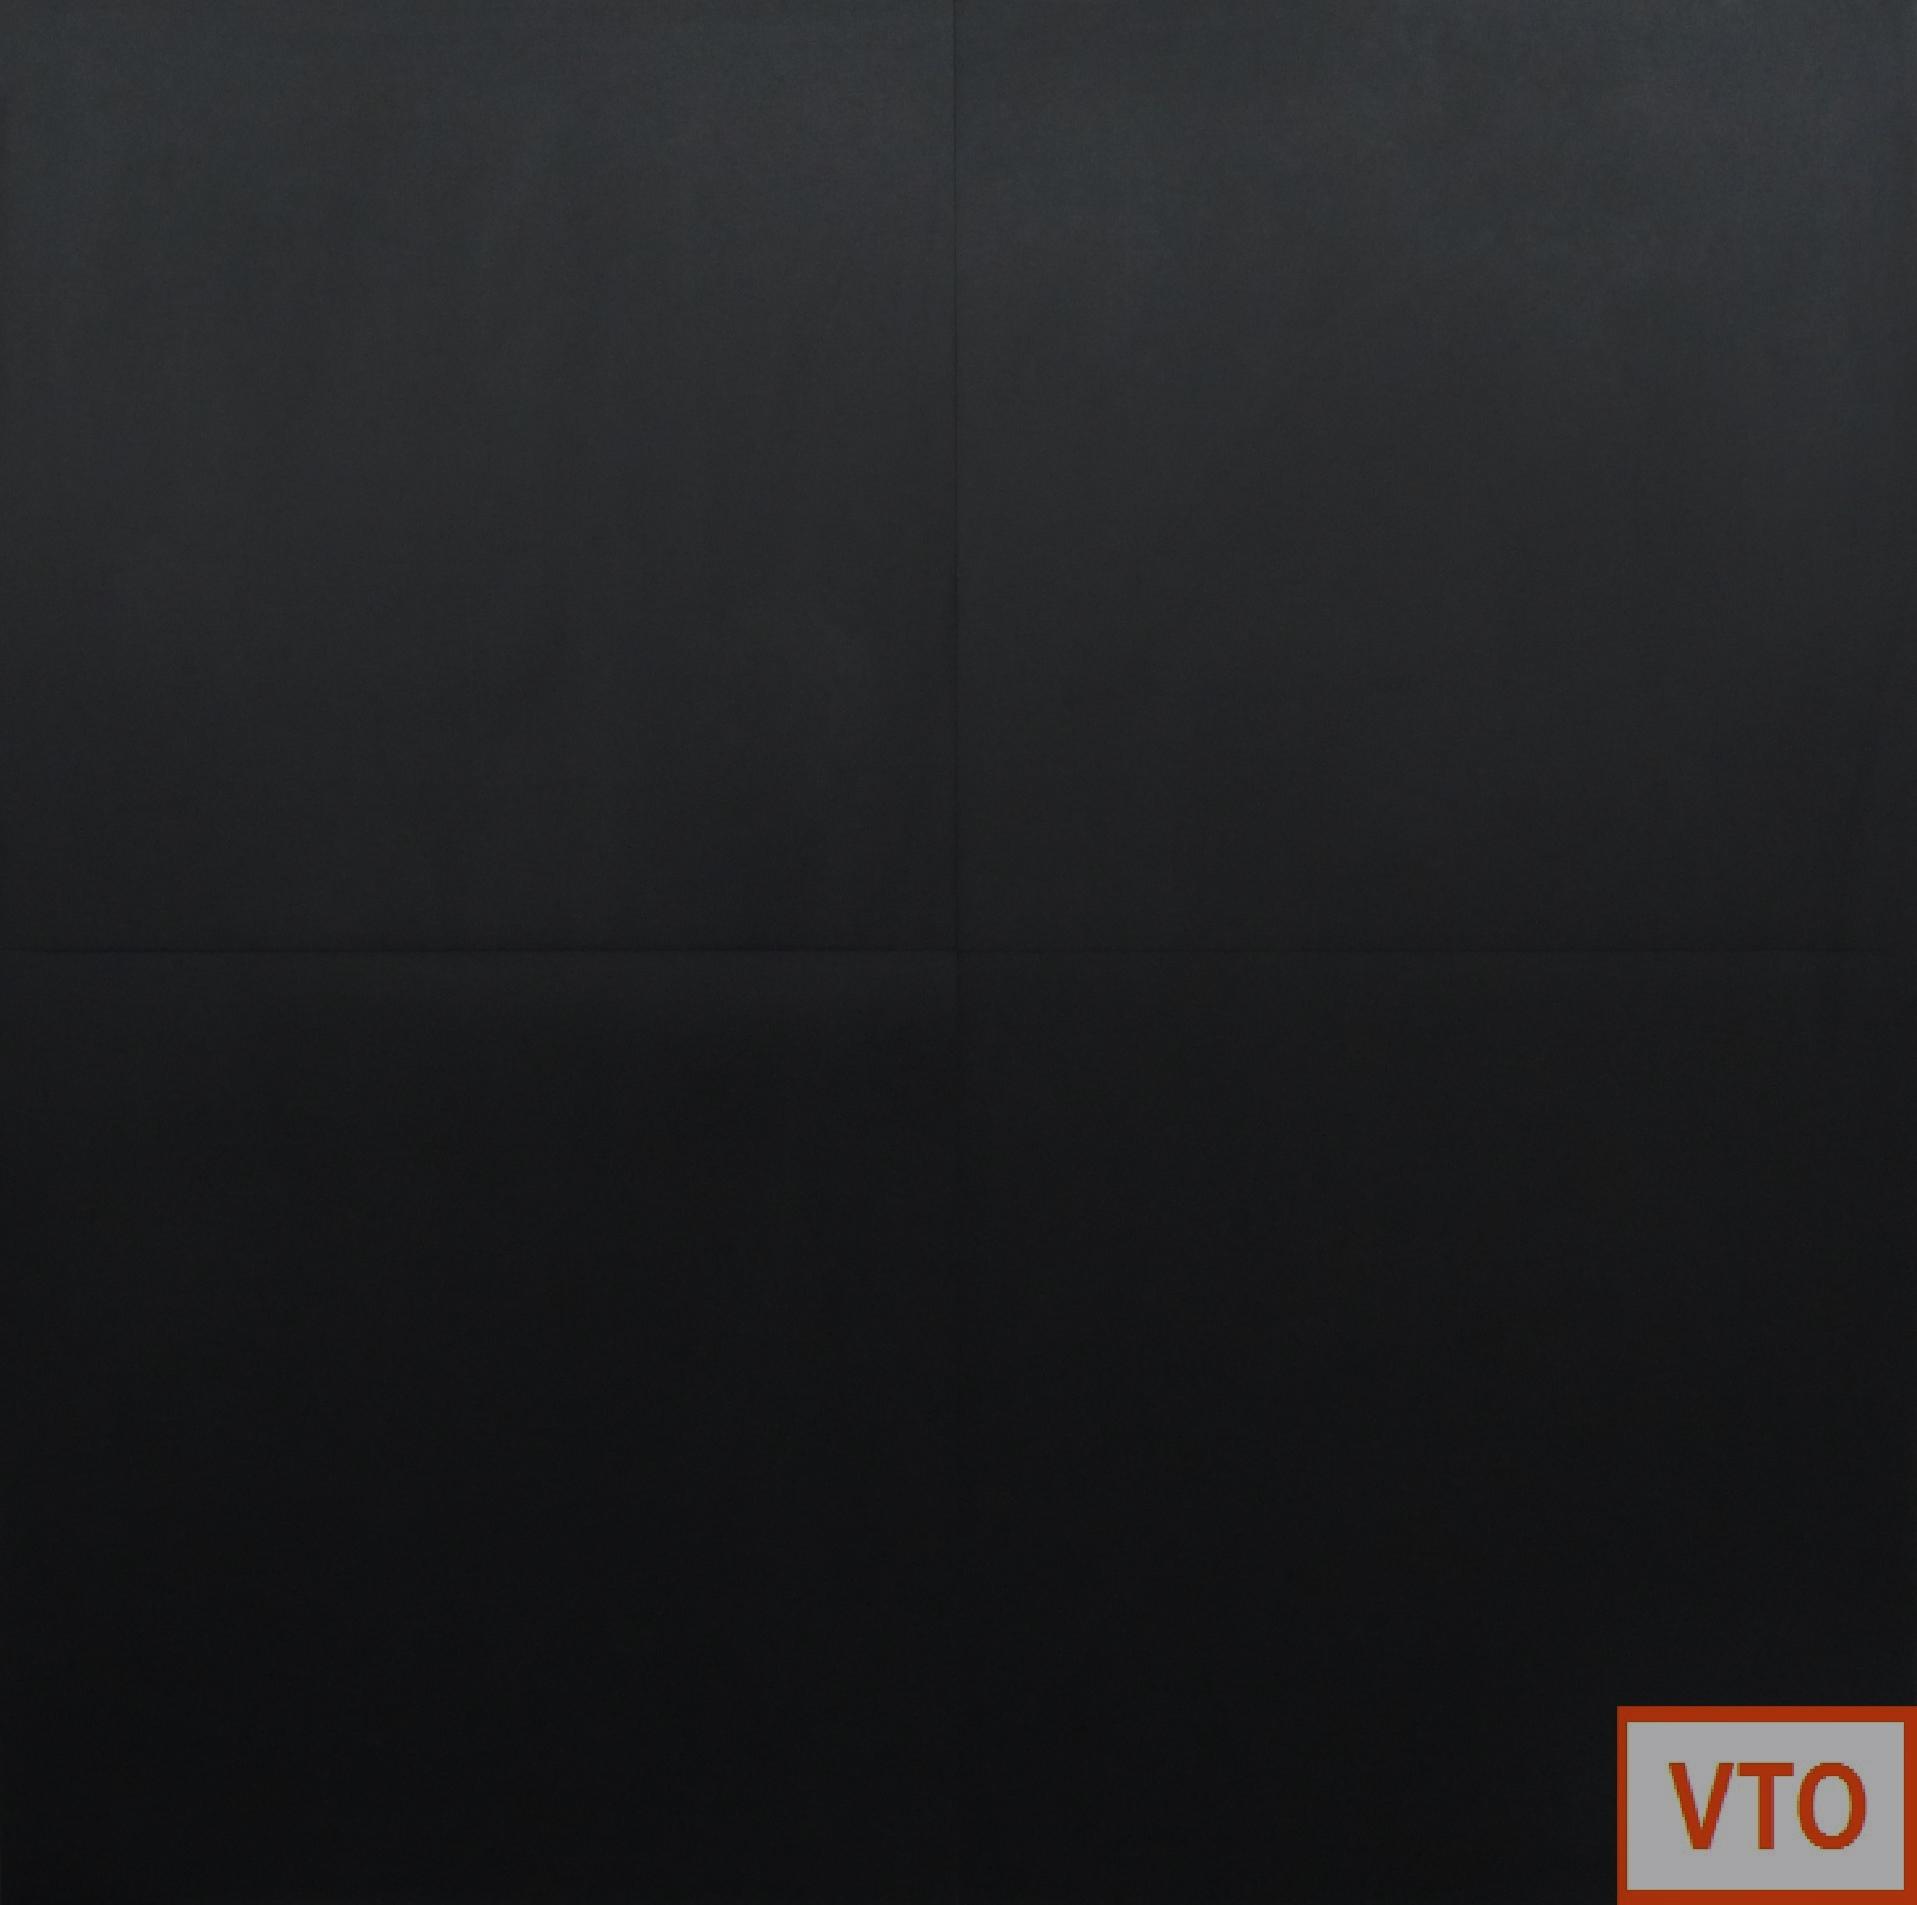 Badkamer Vloertegels 60x60.Zwart Mat 60 X 60 Webshop Vloertegeloutlet Nl Vloertegels